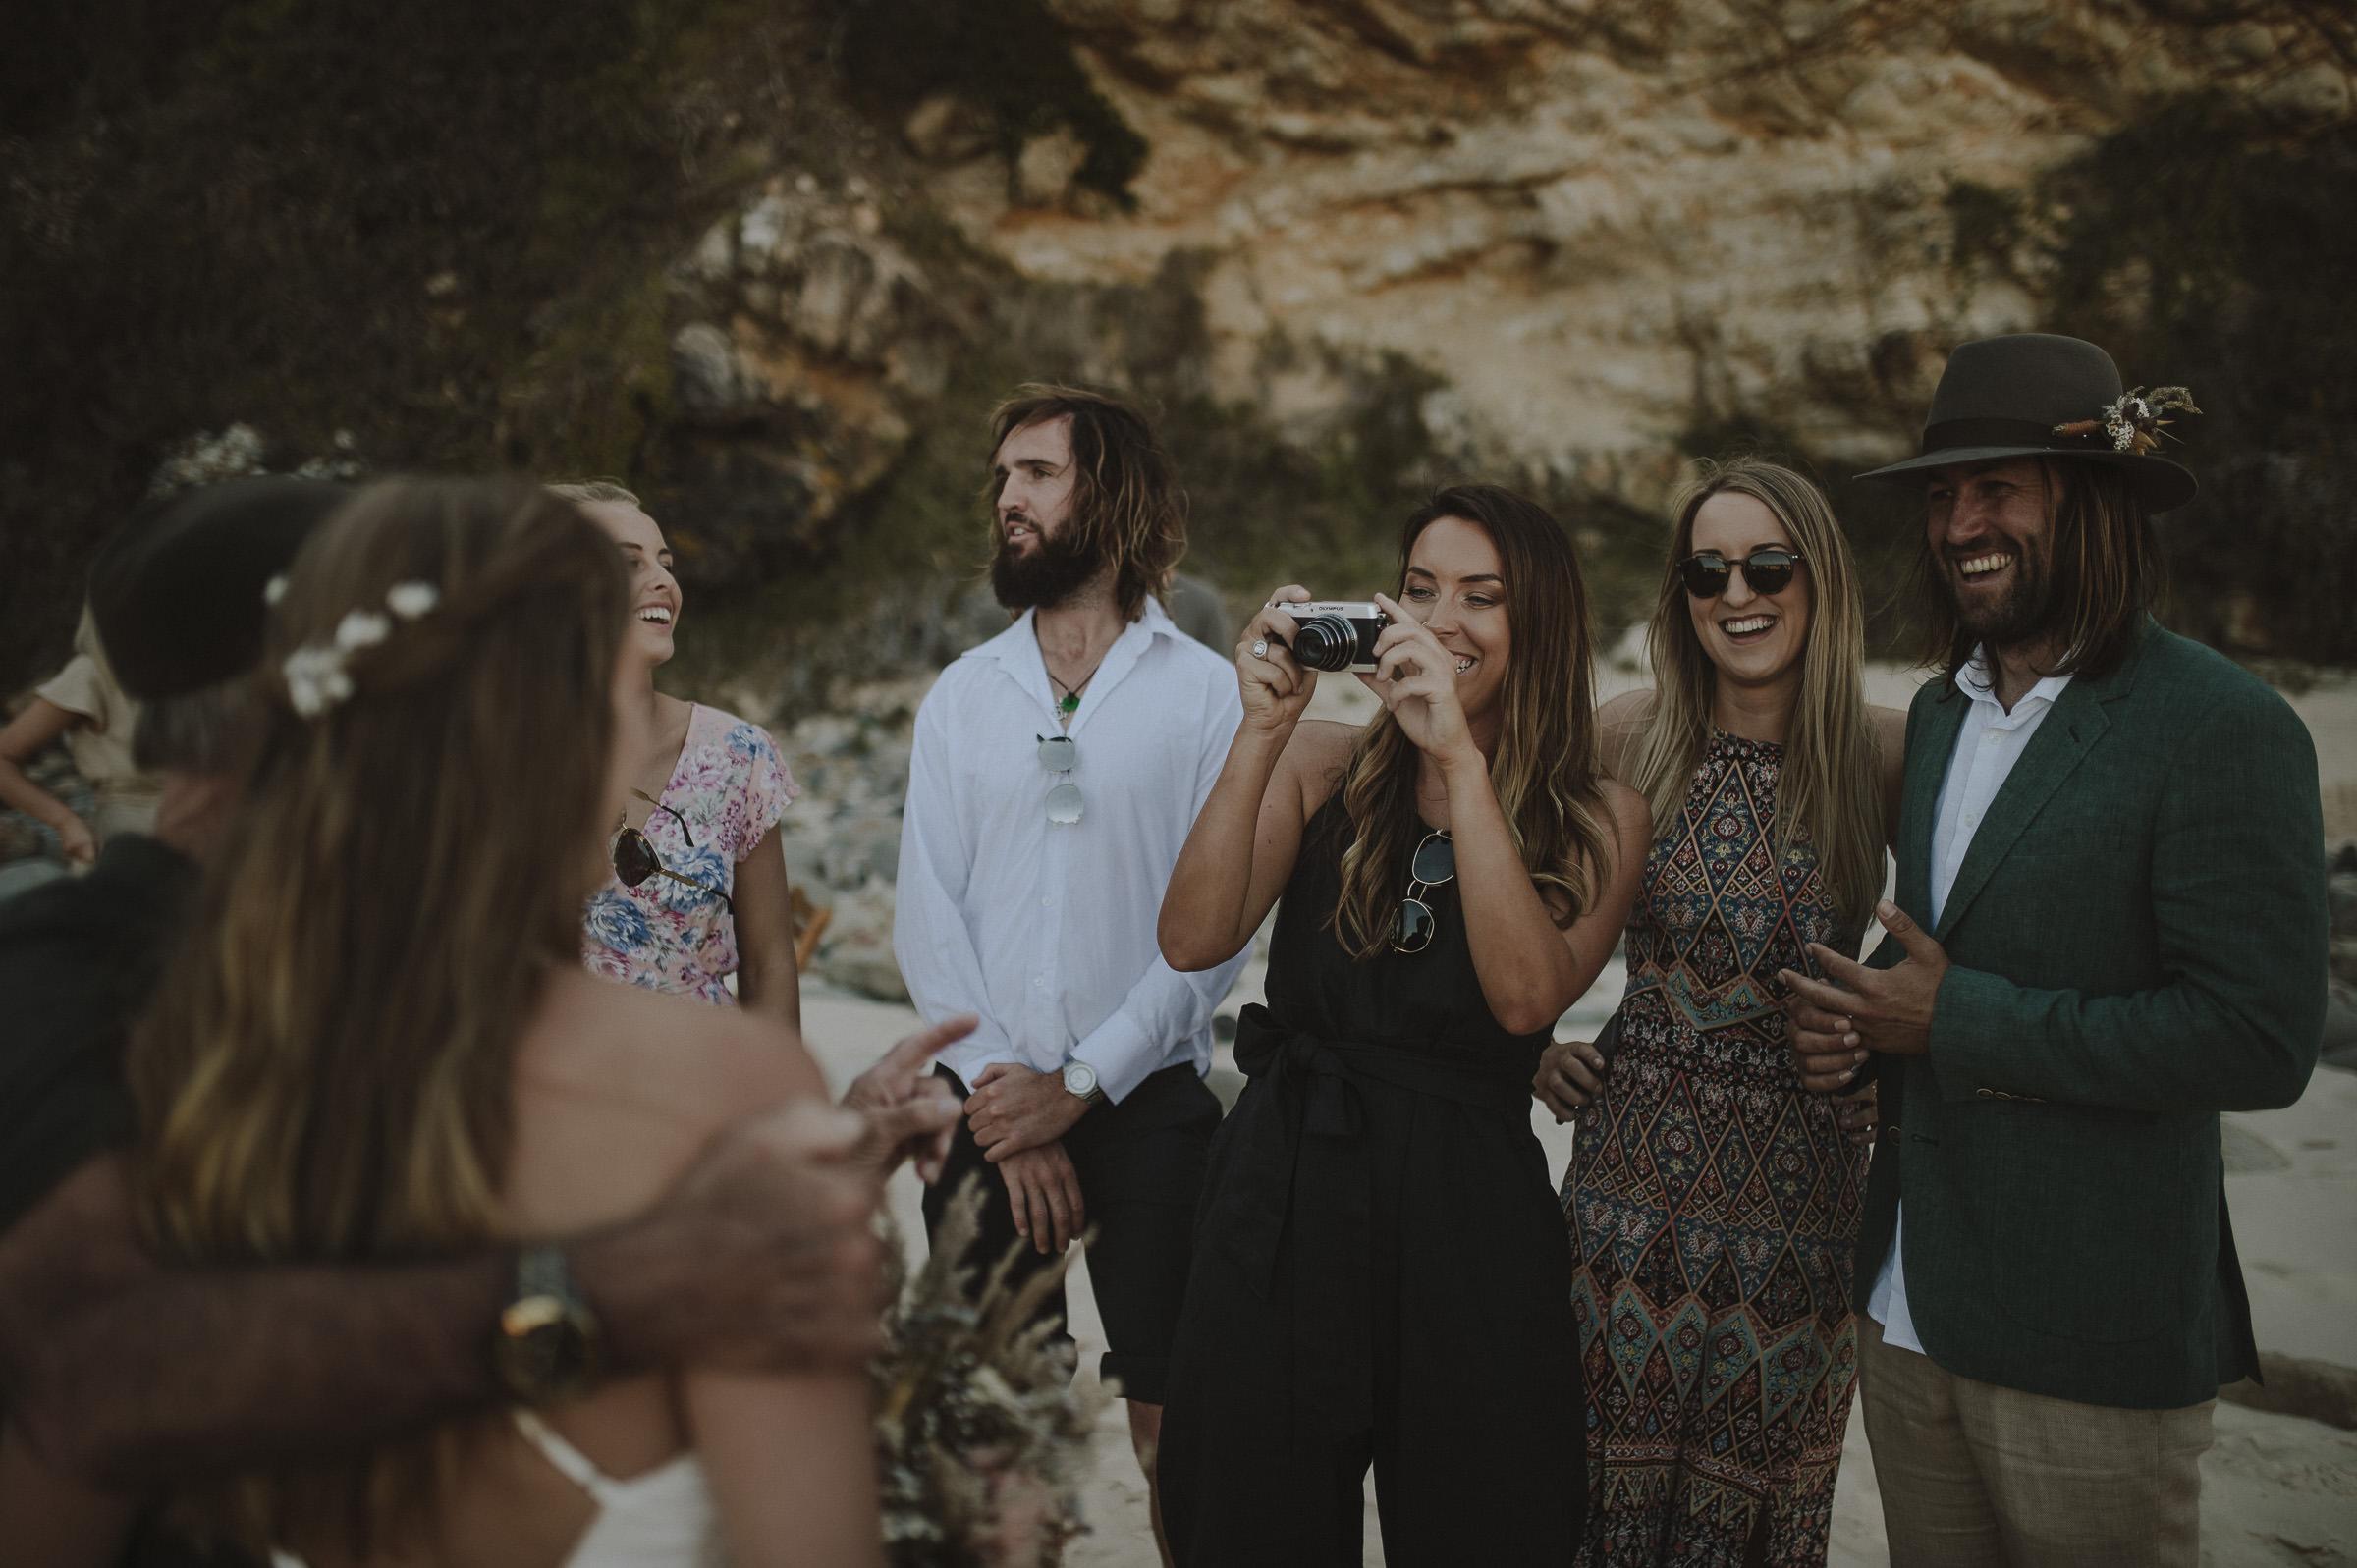 Jack_Millie_Seal_Rocks_Wedding_Photographer_Blog-56.jpg